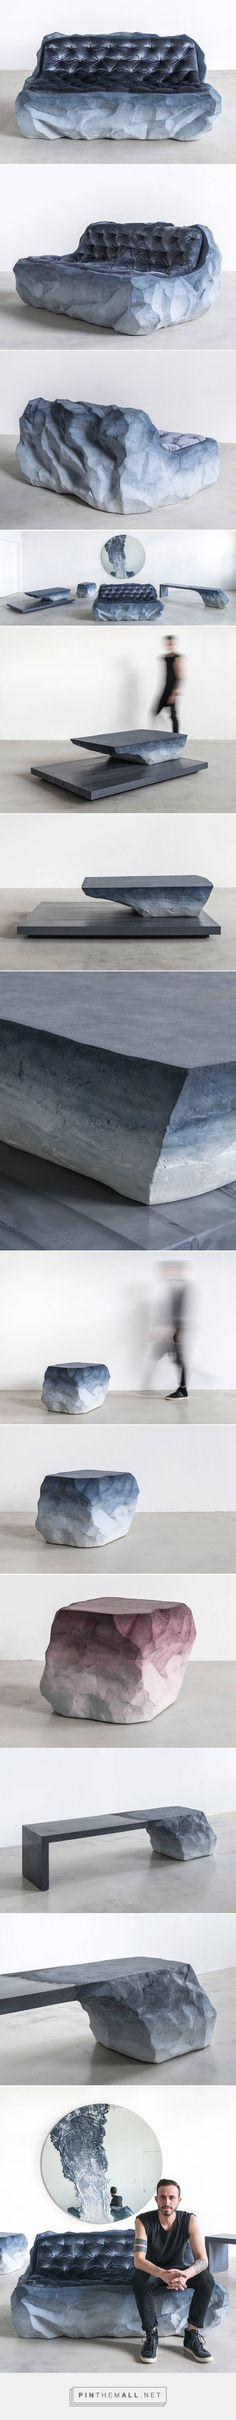 New Sand & Cement Furniture by Fernando Mastrangelo